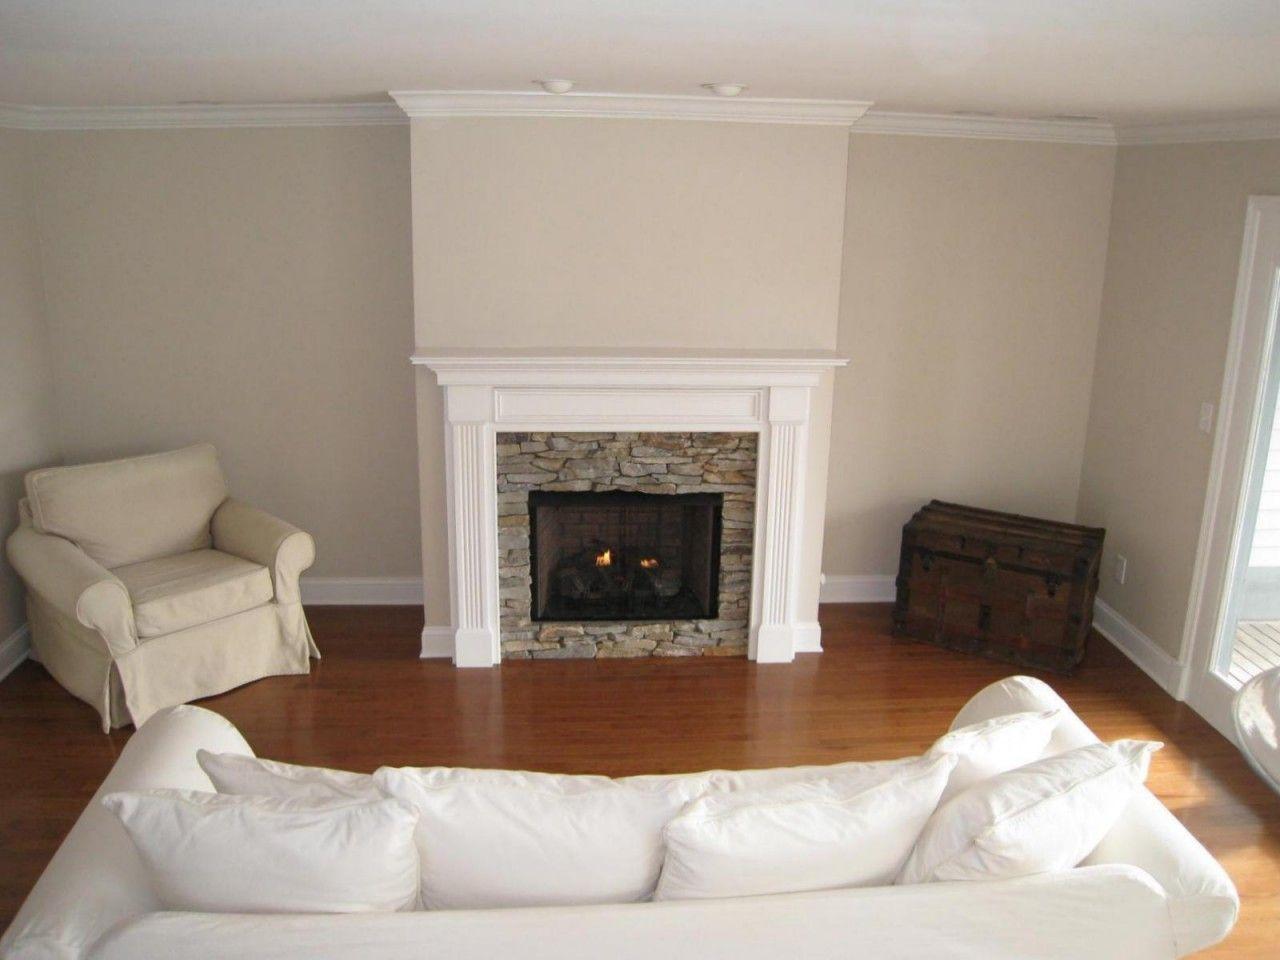 (http://newenglandclassic.com/lewisburg Wood Fireplace Mantel Custom/)